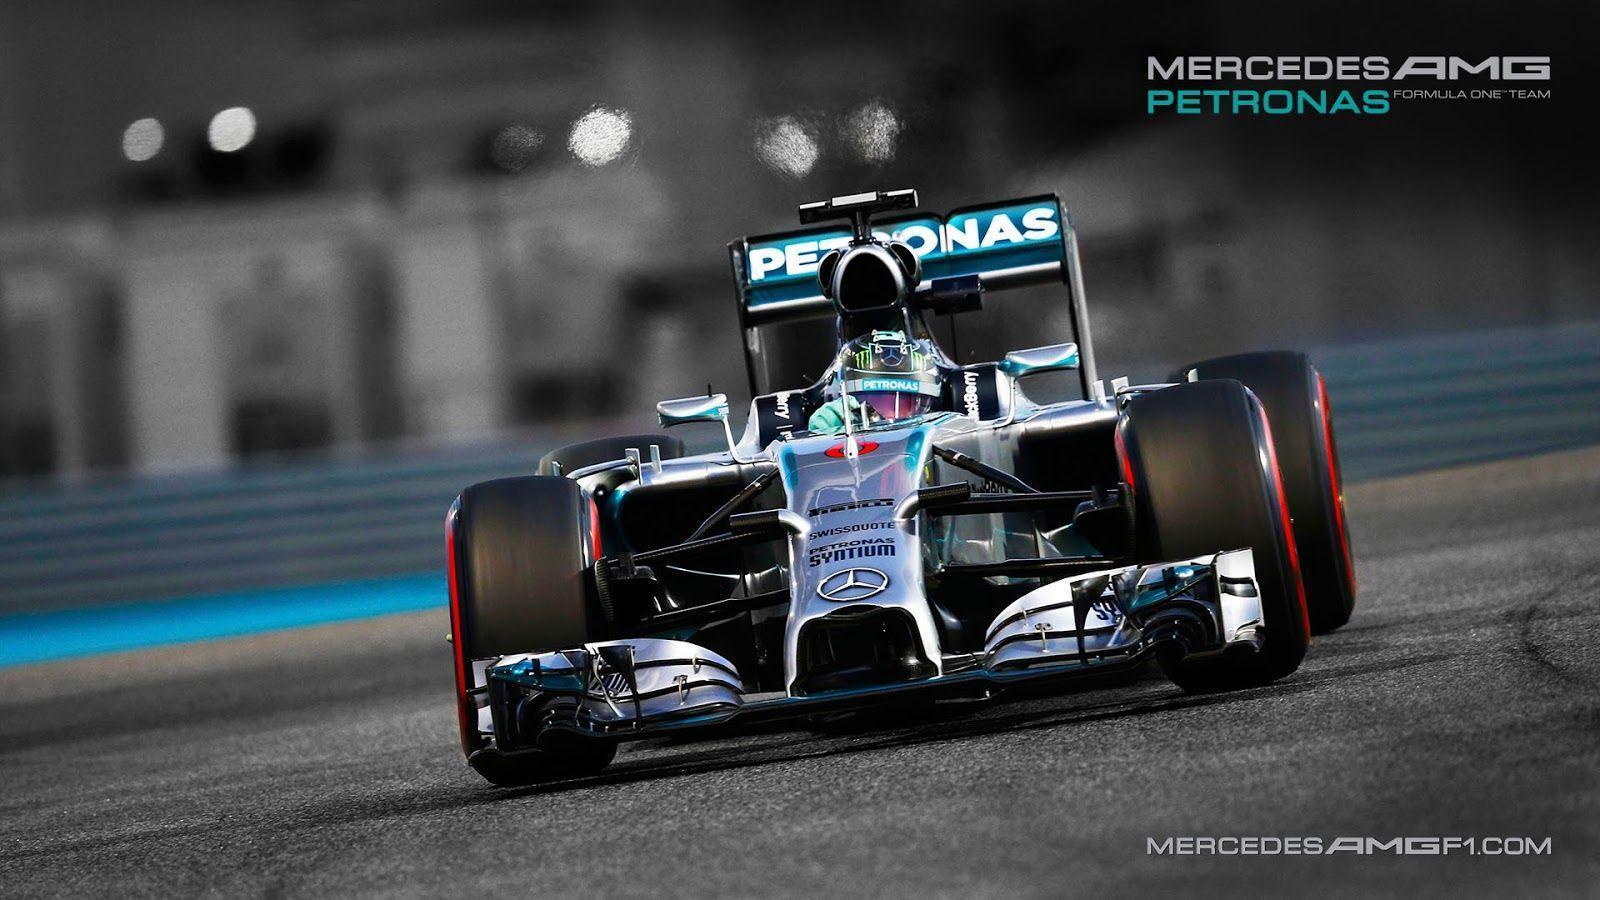 Mercedes w08 wallpapers wallpaper cave for Mercedes benz f1